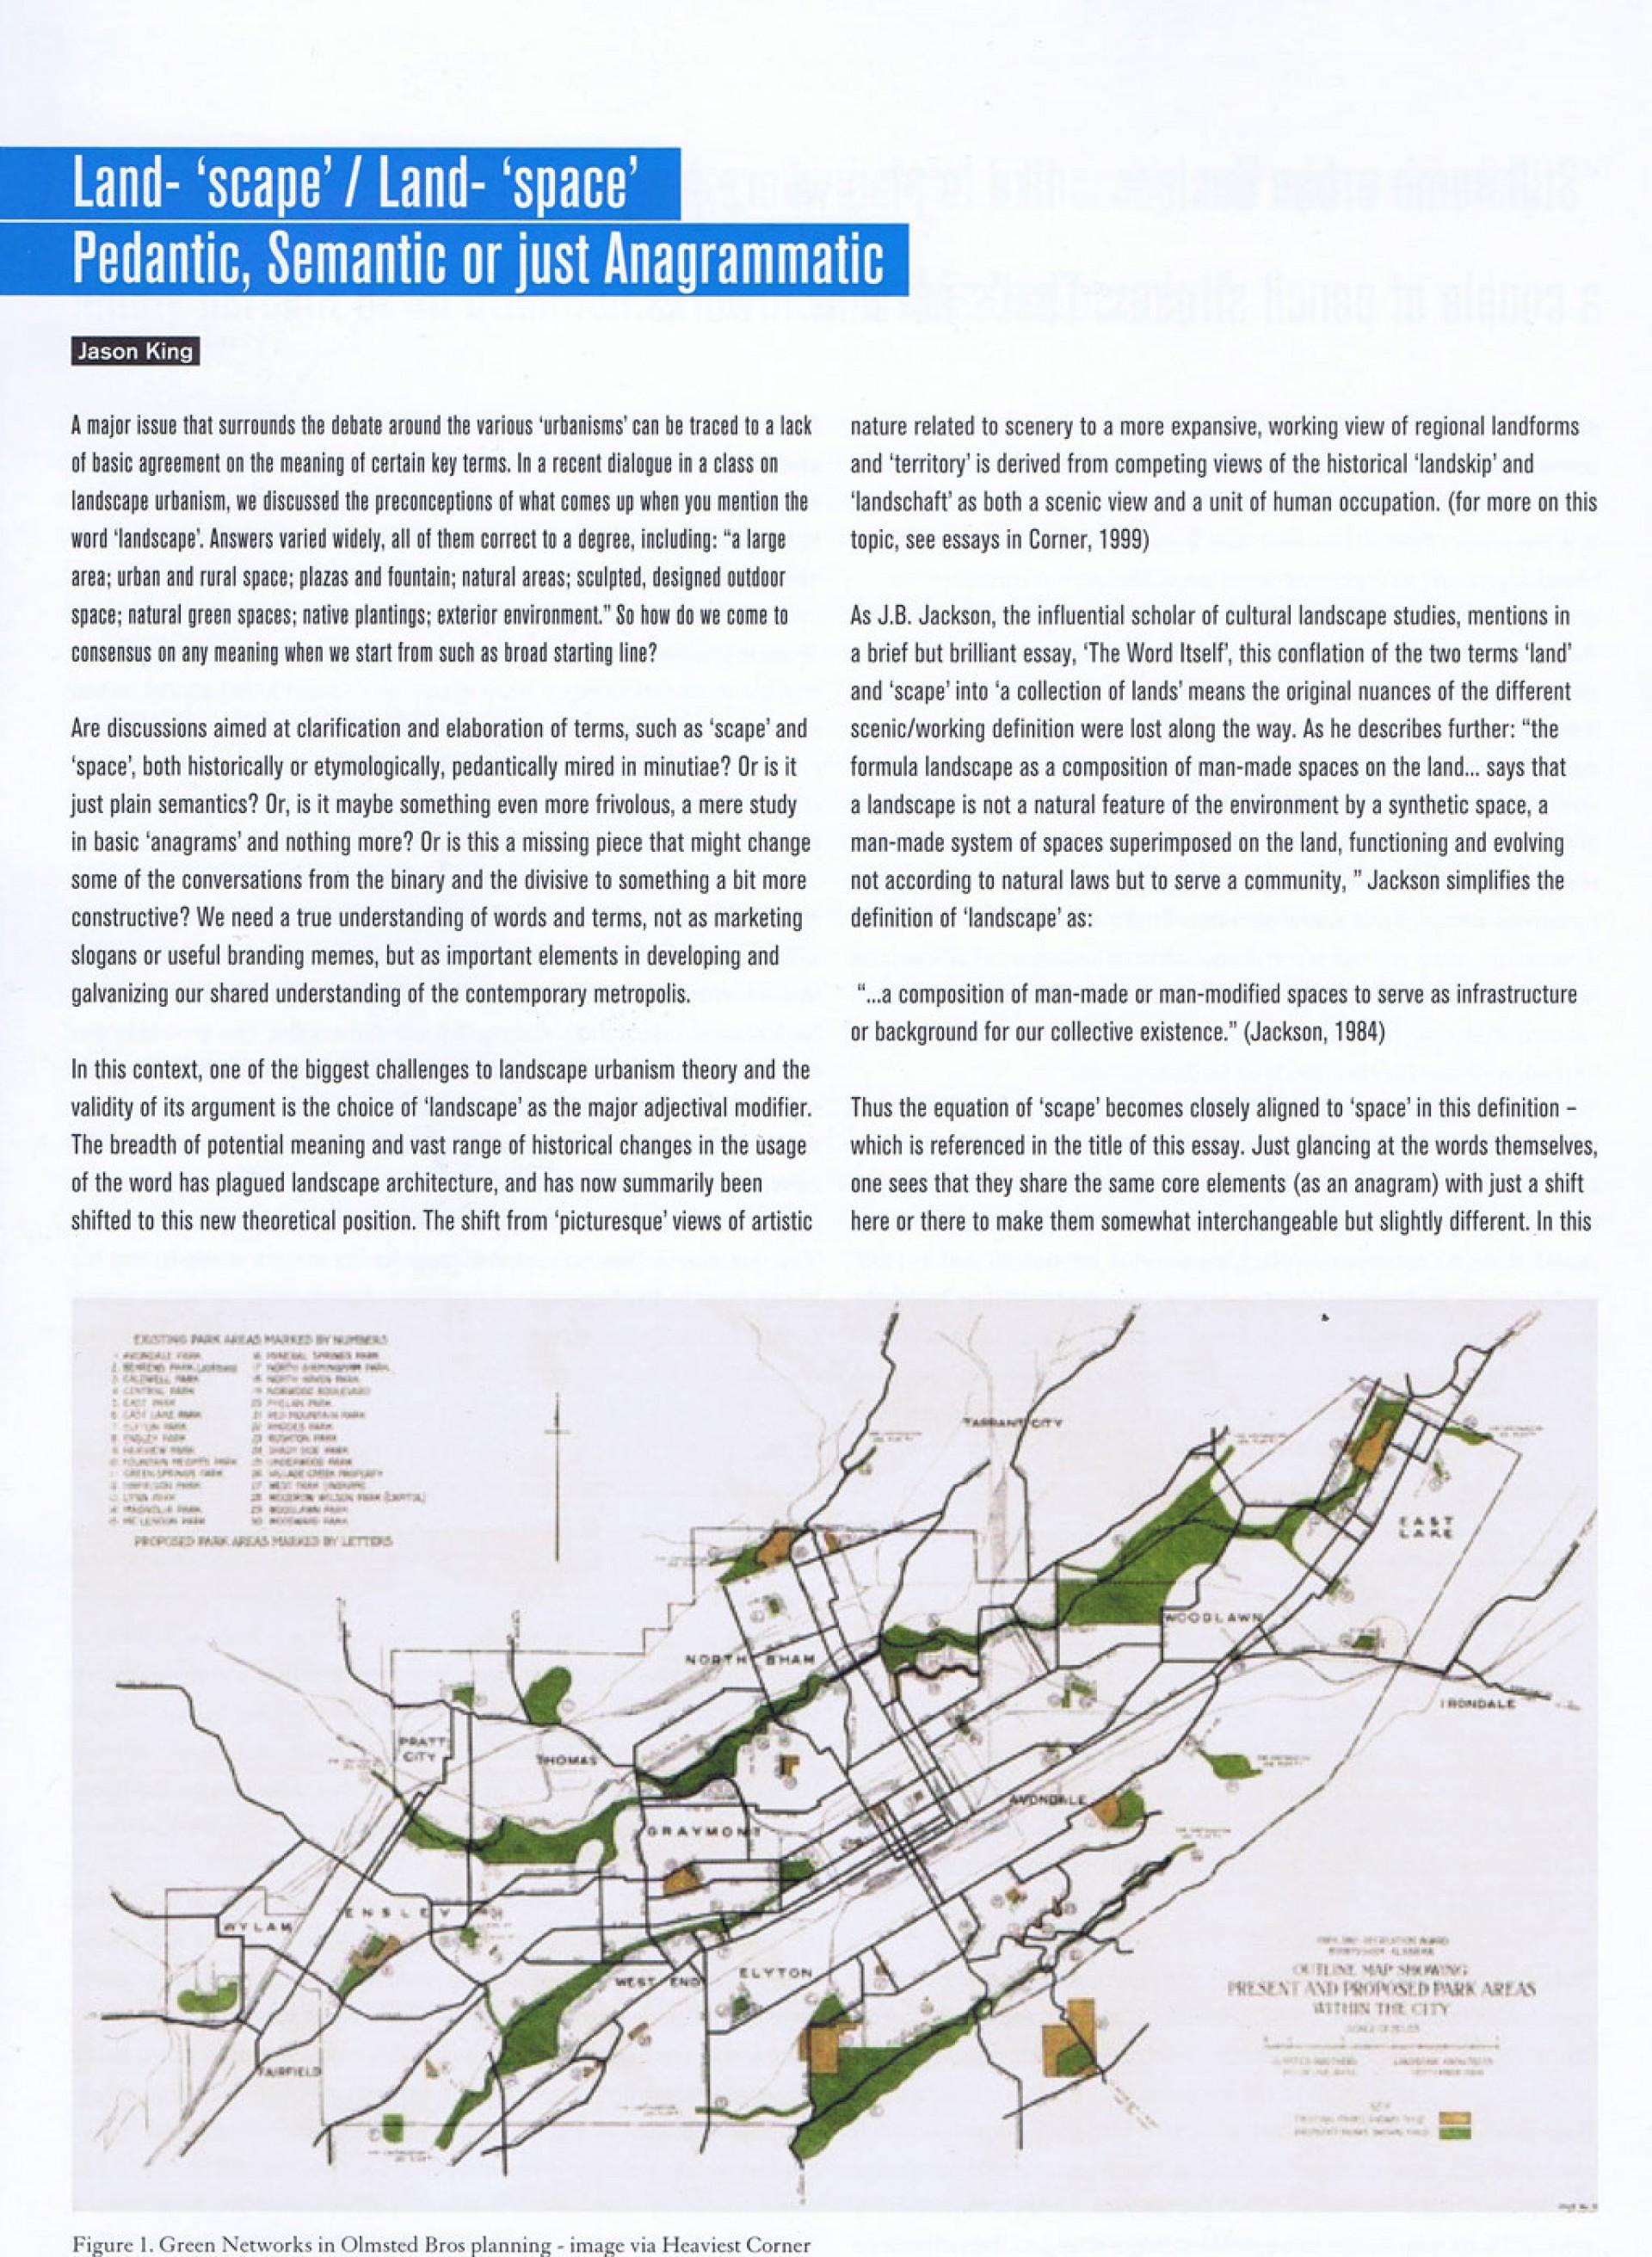 006 Landscape Architecture Essay Atlantis Web Stunning Argumentative Topics 1920